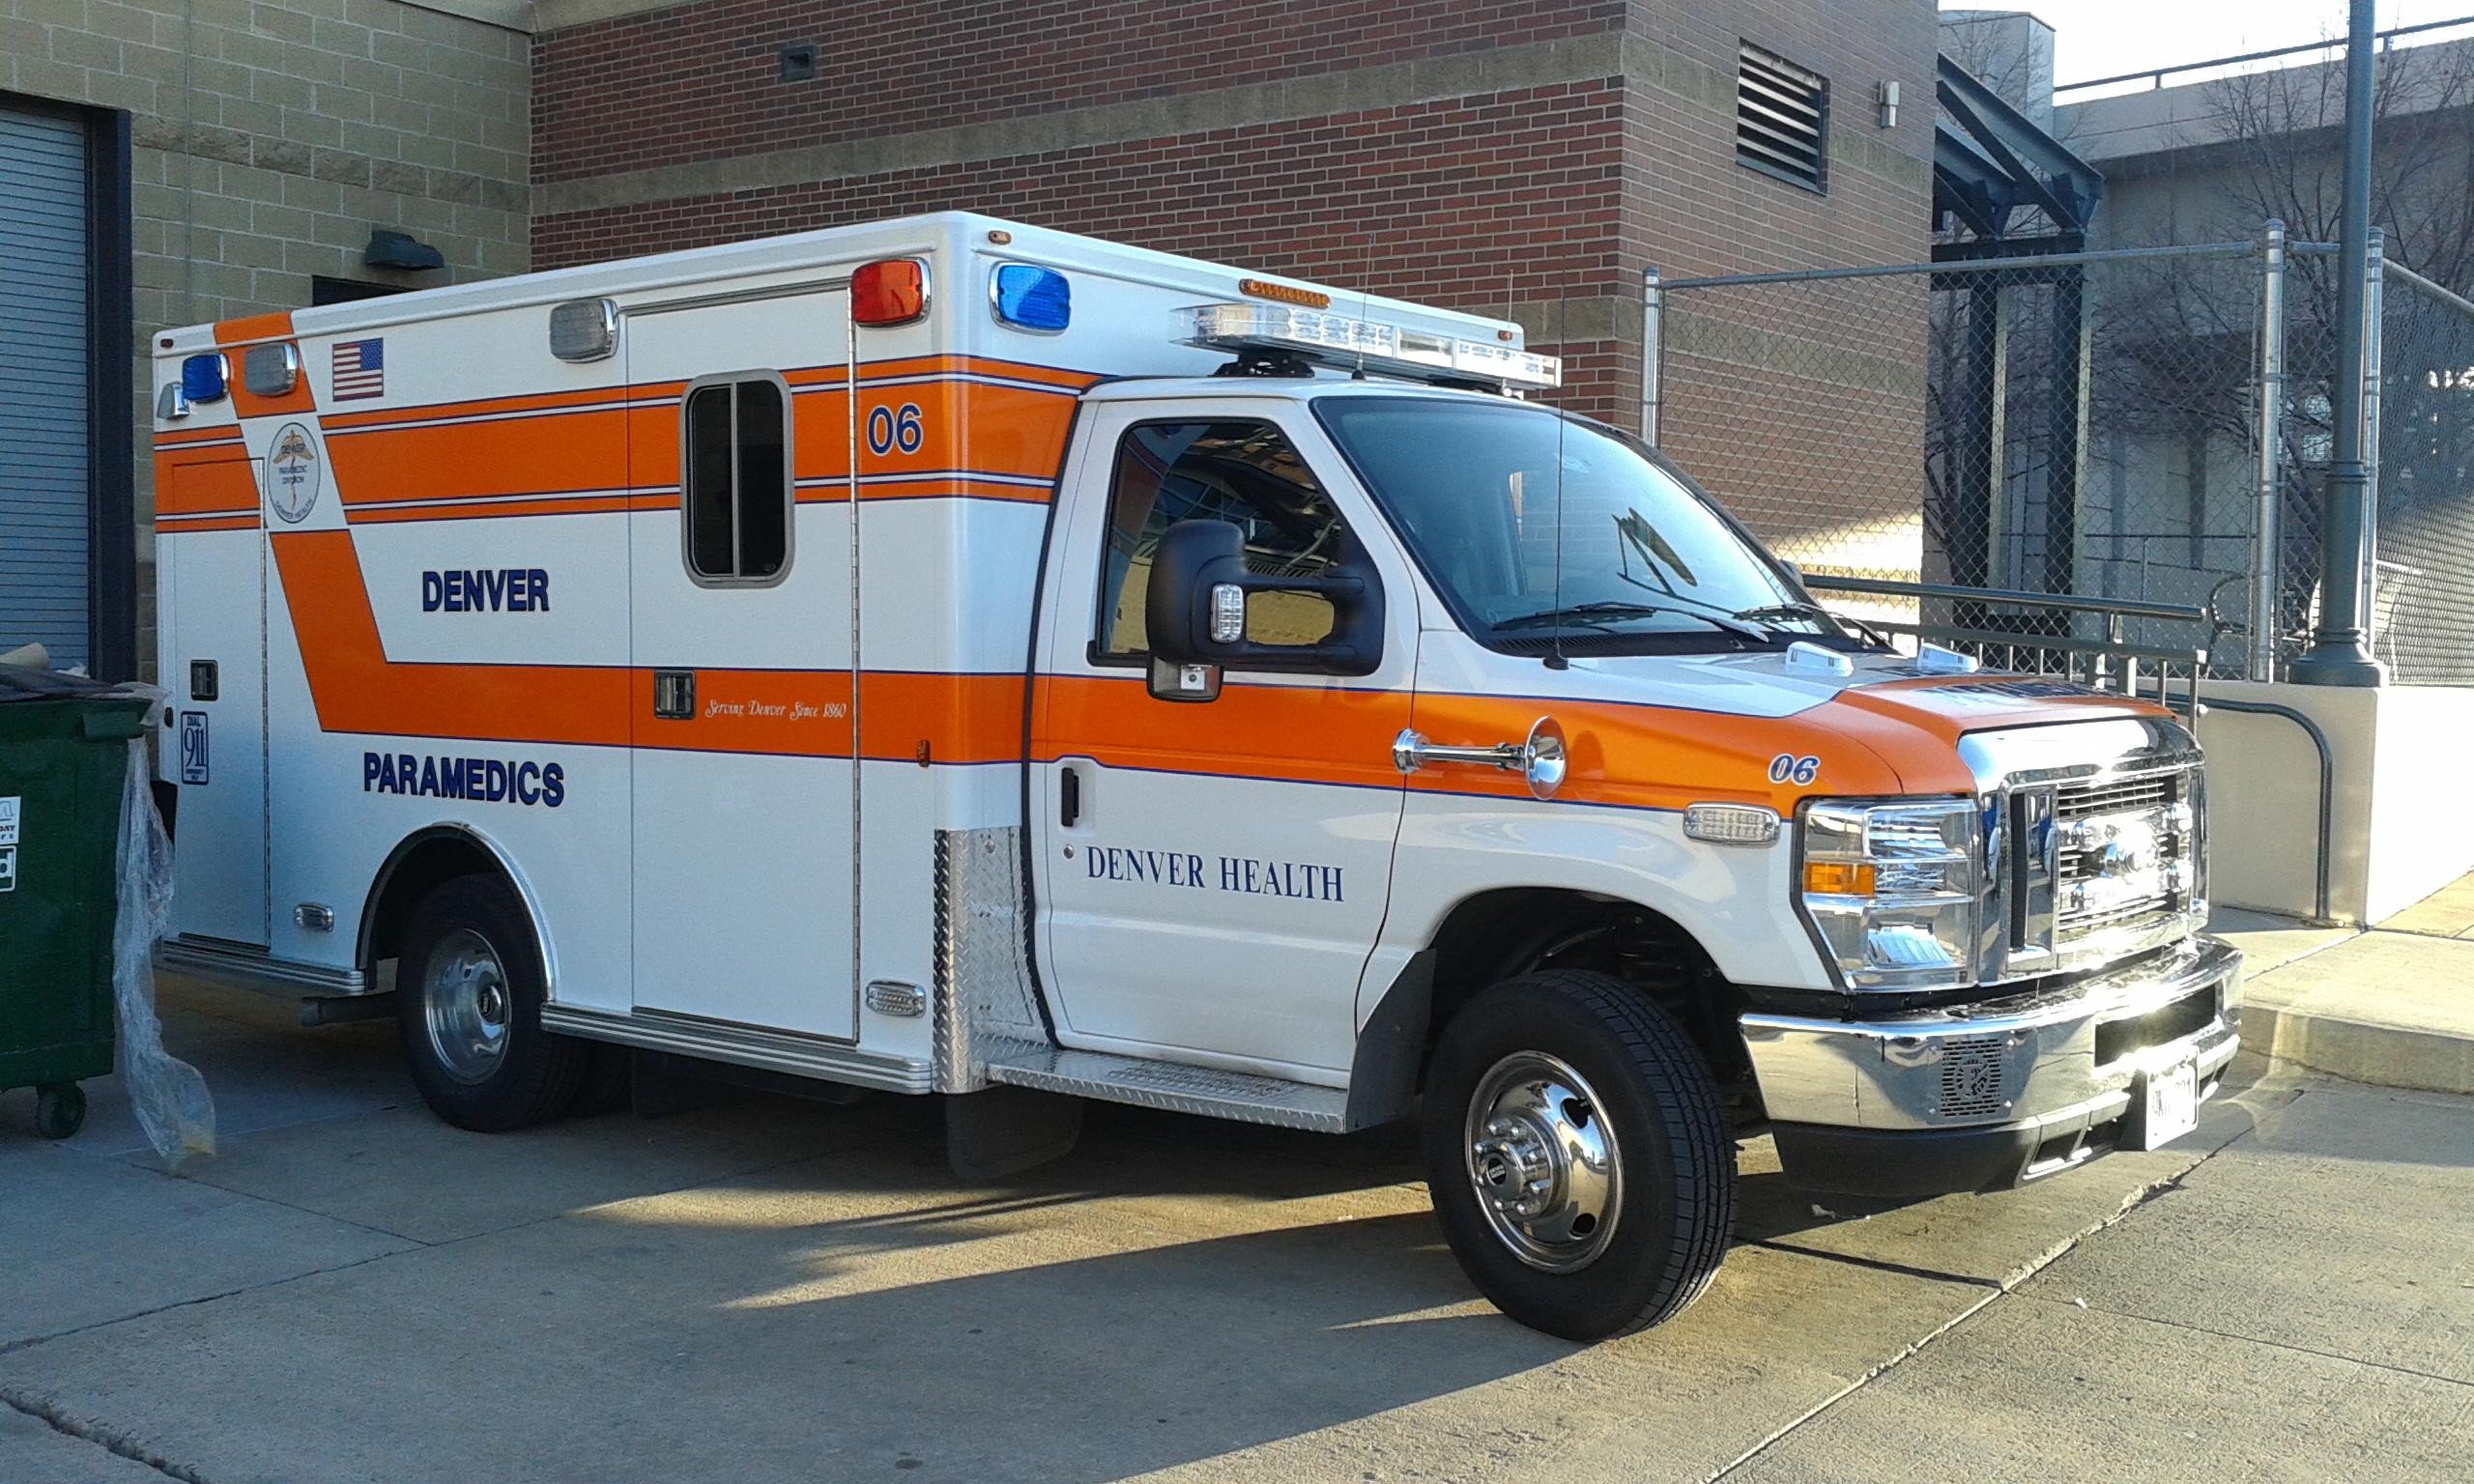 File:Denver Health Paramedics ambulance, Coors Field.jpg ...